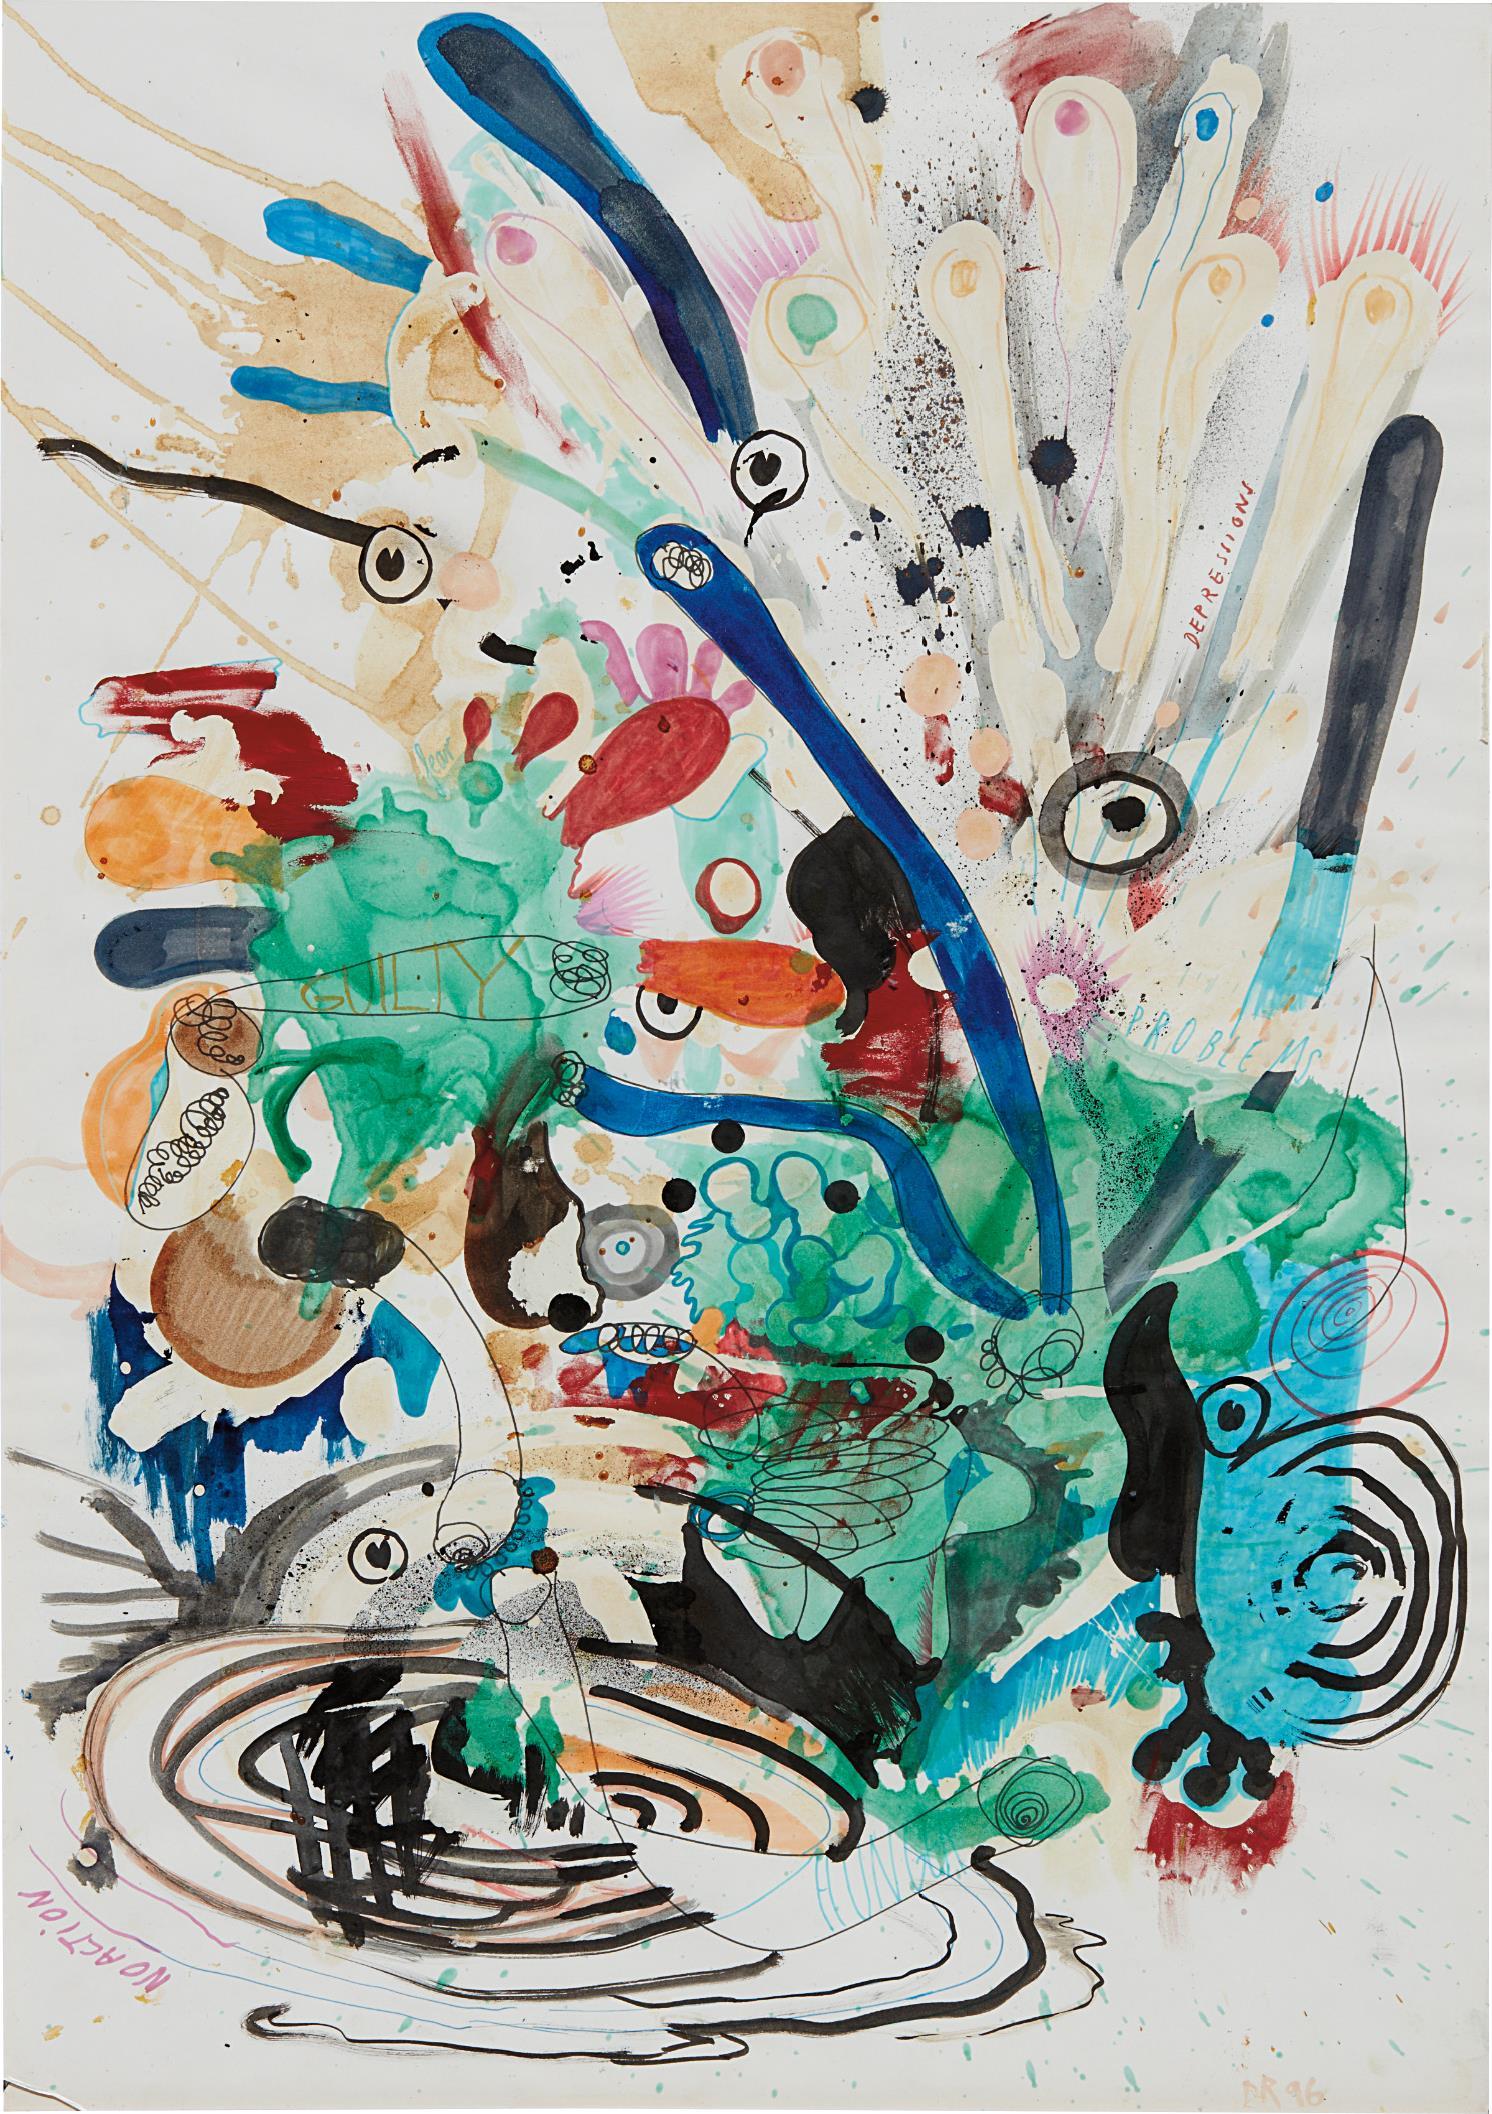 Daniel Richter-Delirium Tremens-1996